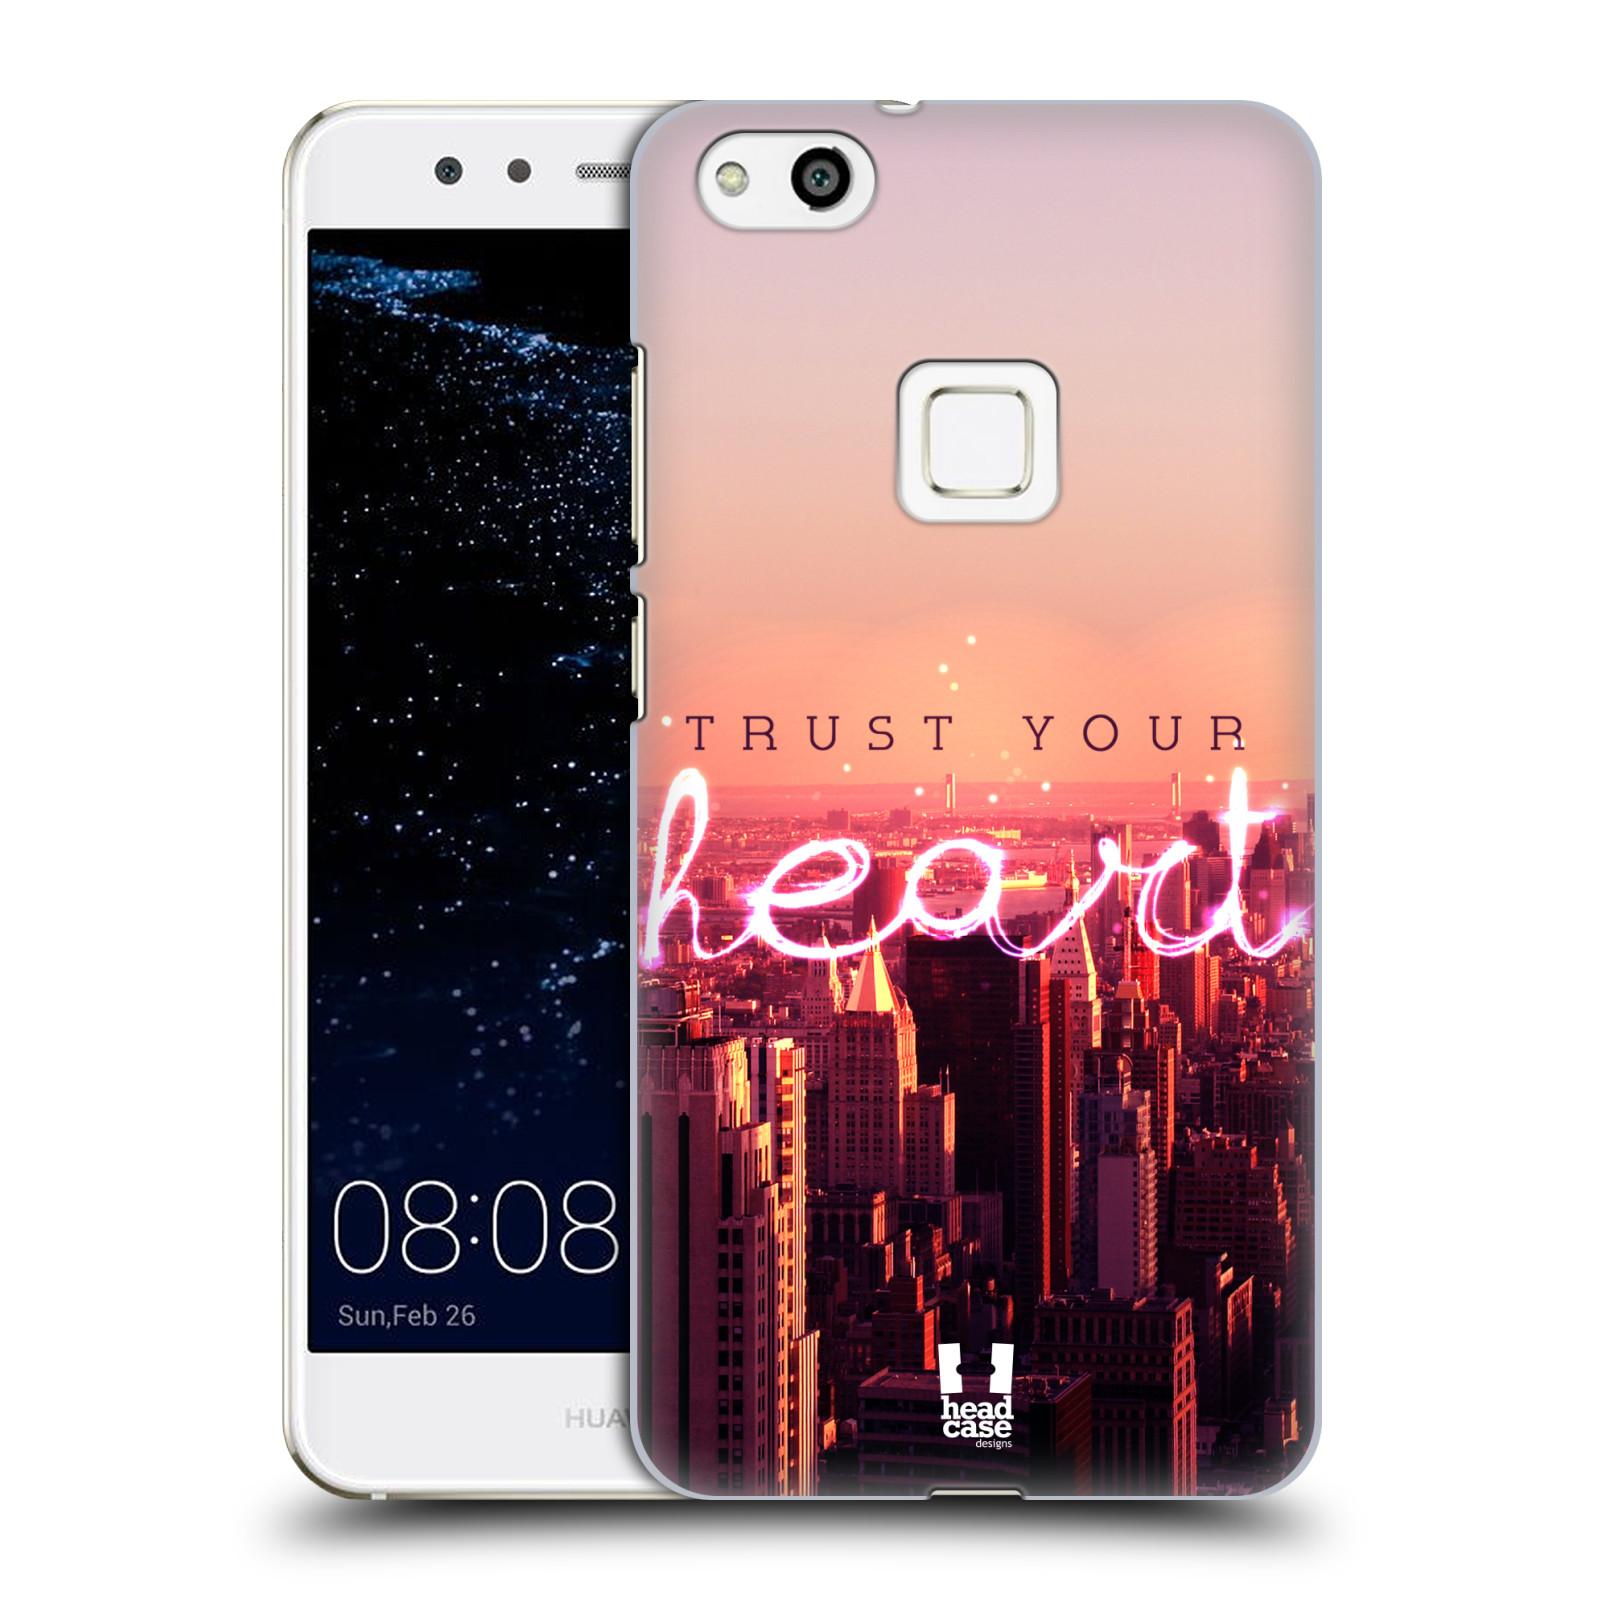 Plastové pouzdro na mobil Huawei P10 Lite Head Case - TRUST YOUR HEART (Plastový kryt či obal na mobilní telefon Huawei P10 Lite Dual SIM (LX1/LX1A))